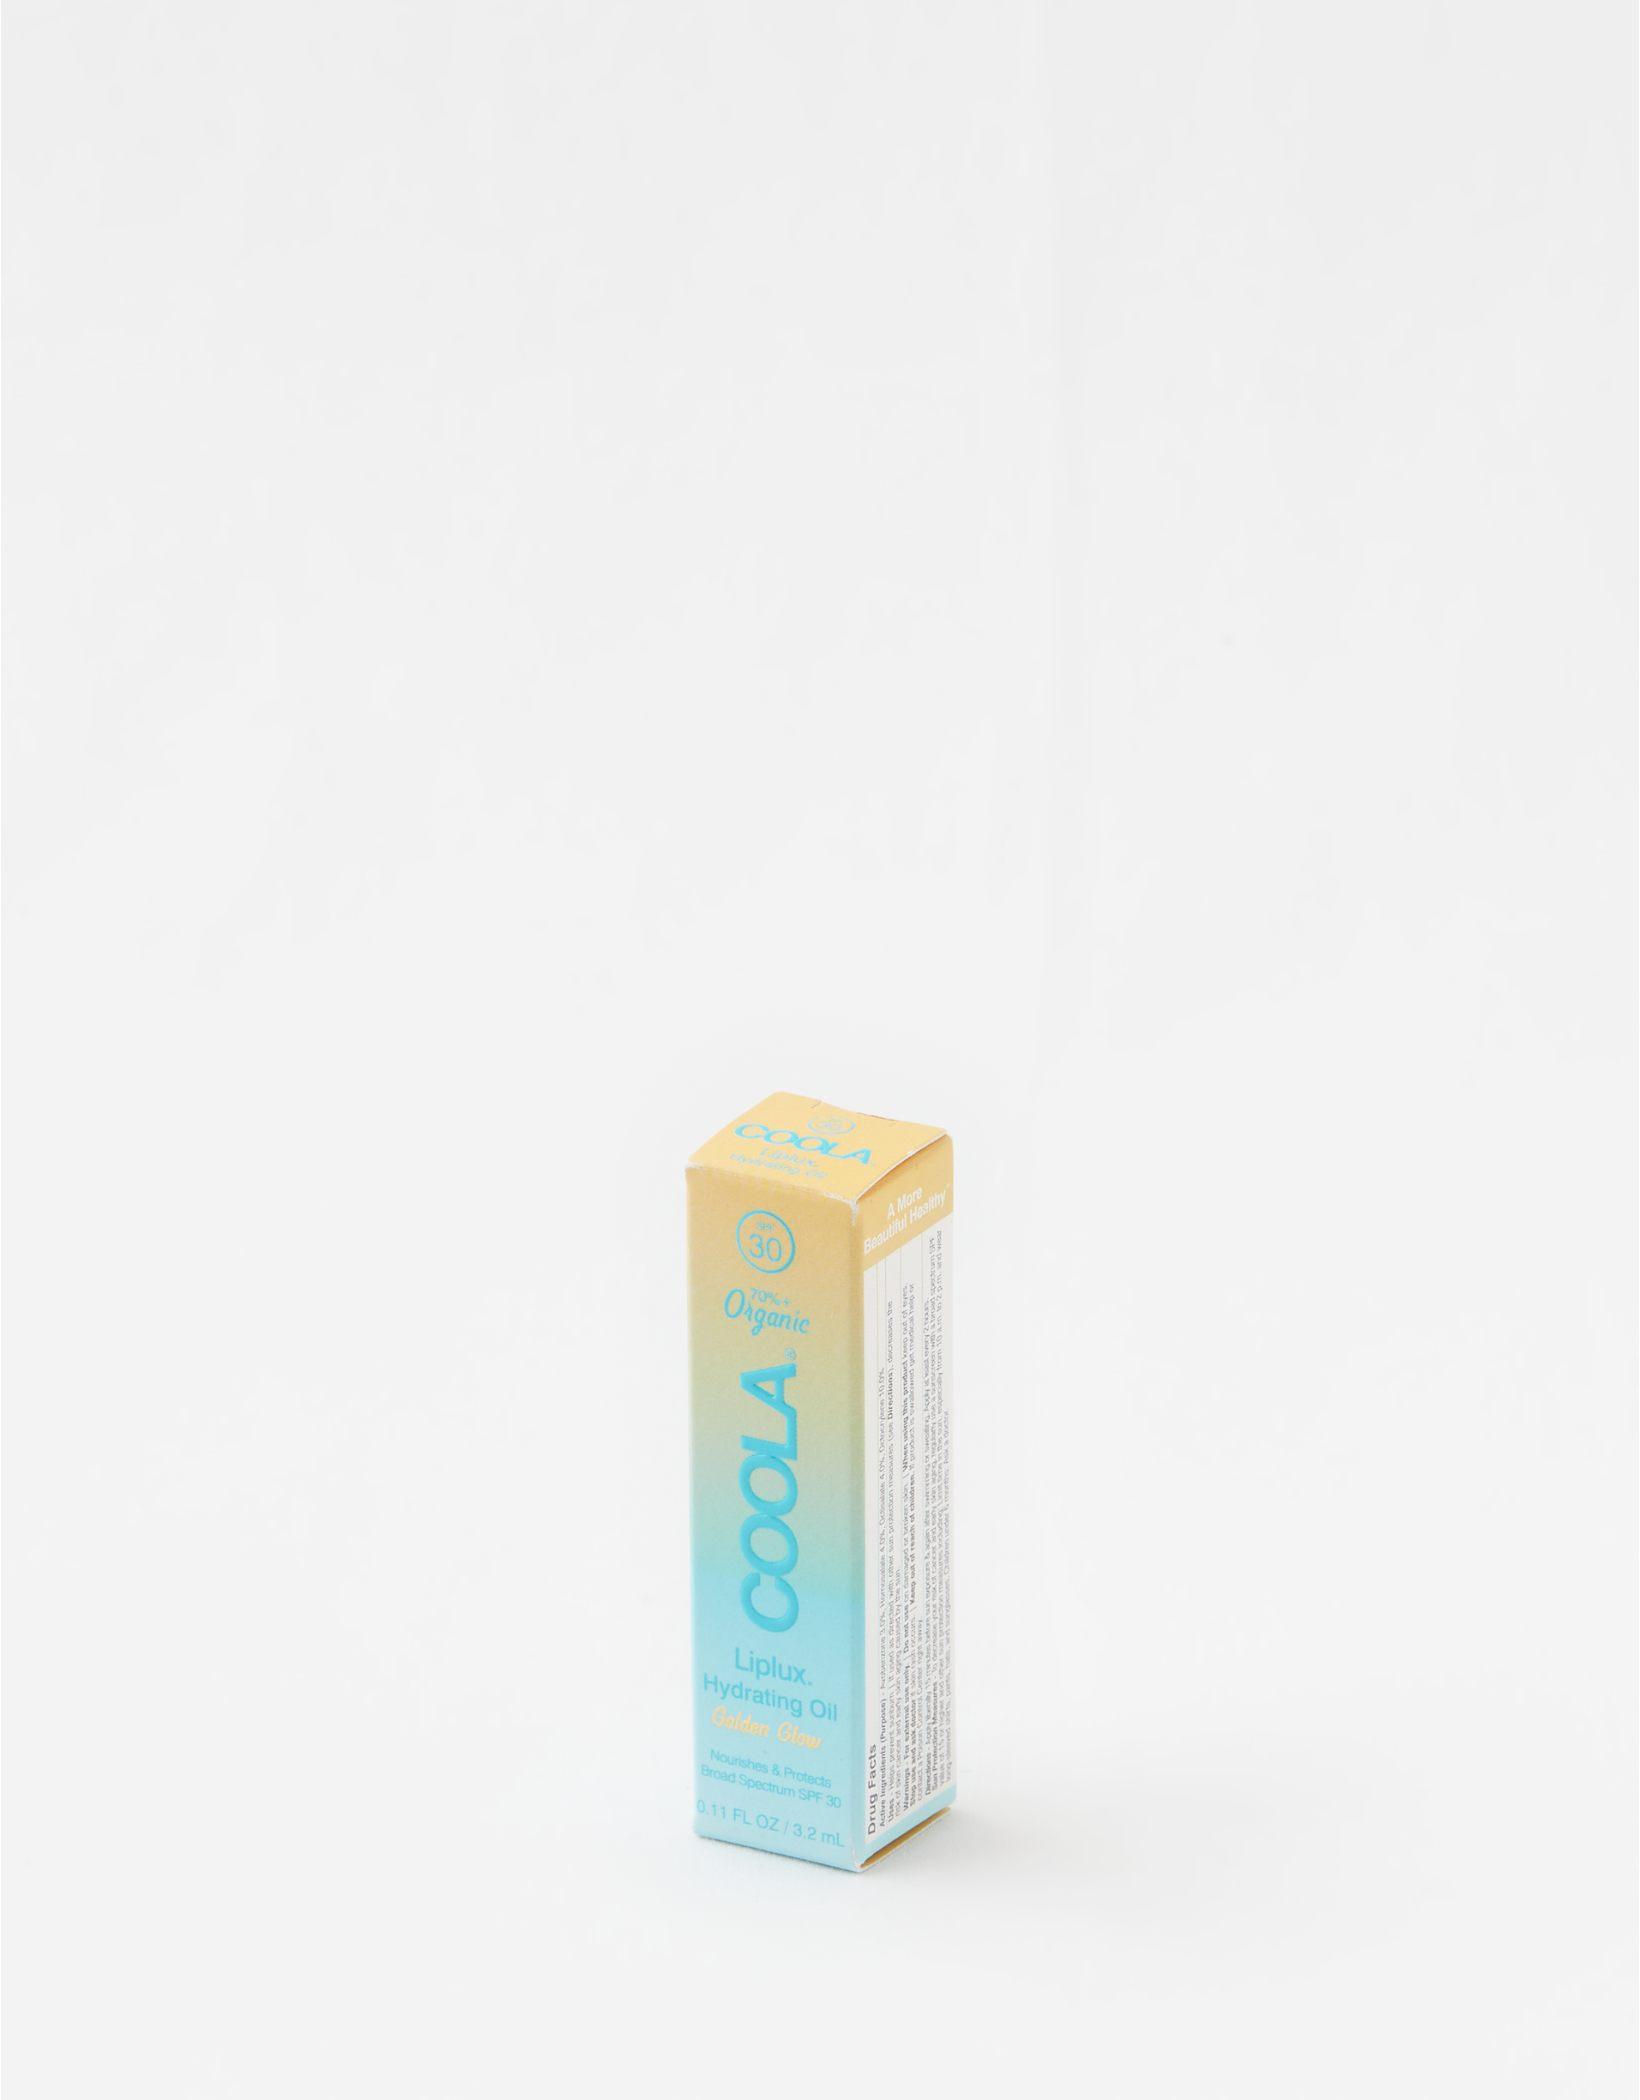 Coola Hydrating Lip Oil Sunscreen - SPF 30